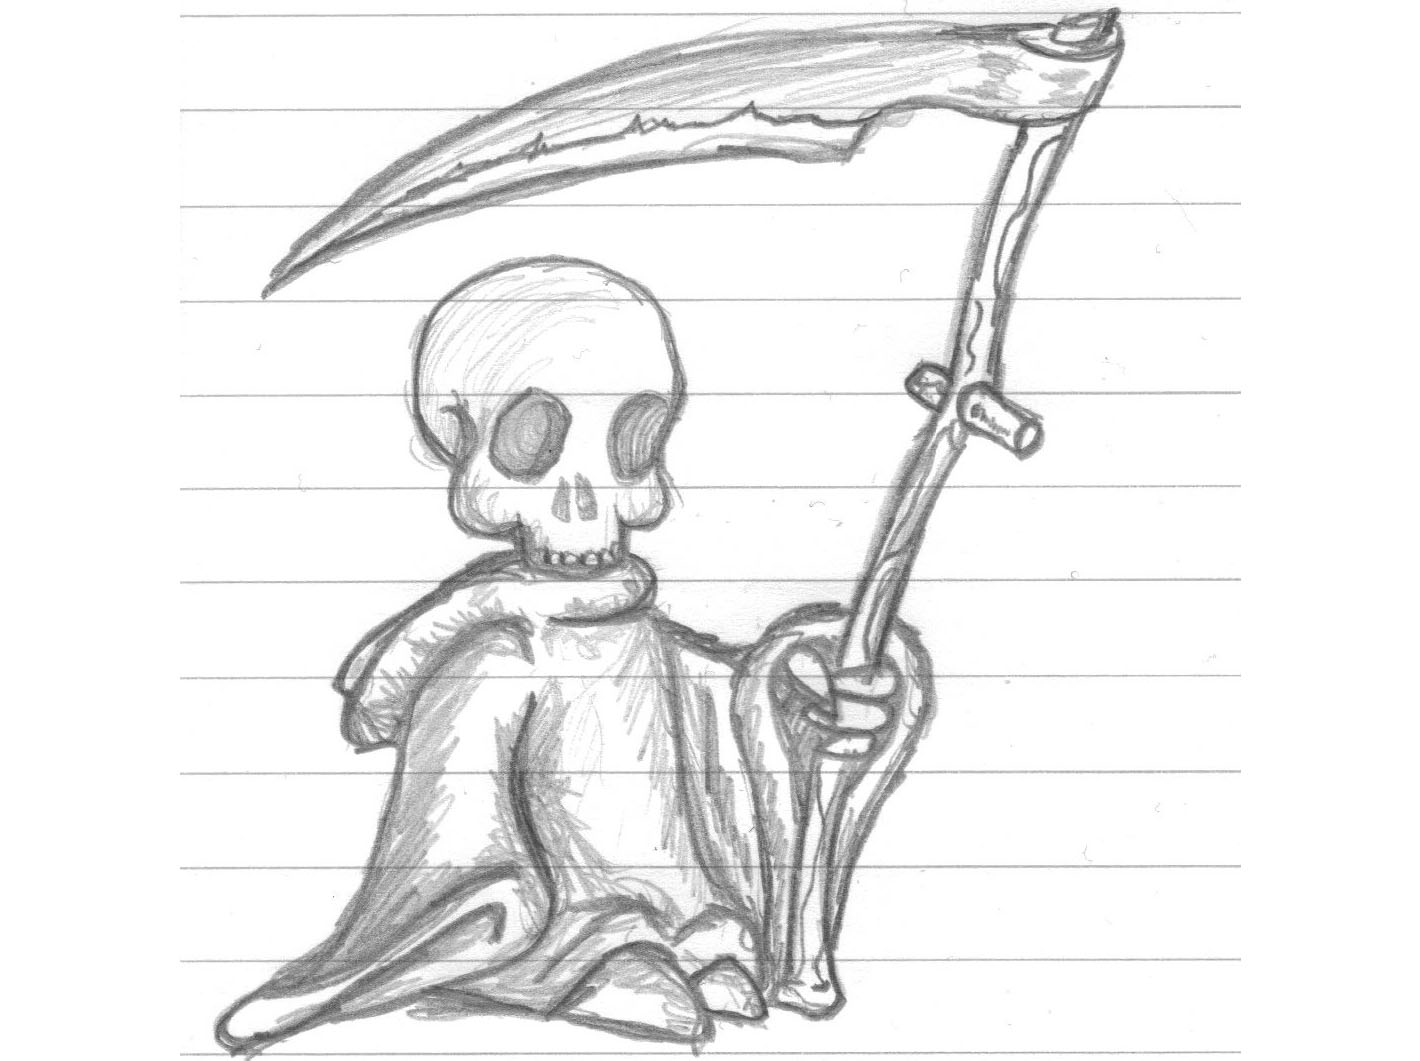 Design-88: Lil Grim Reaper